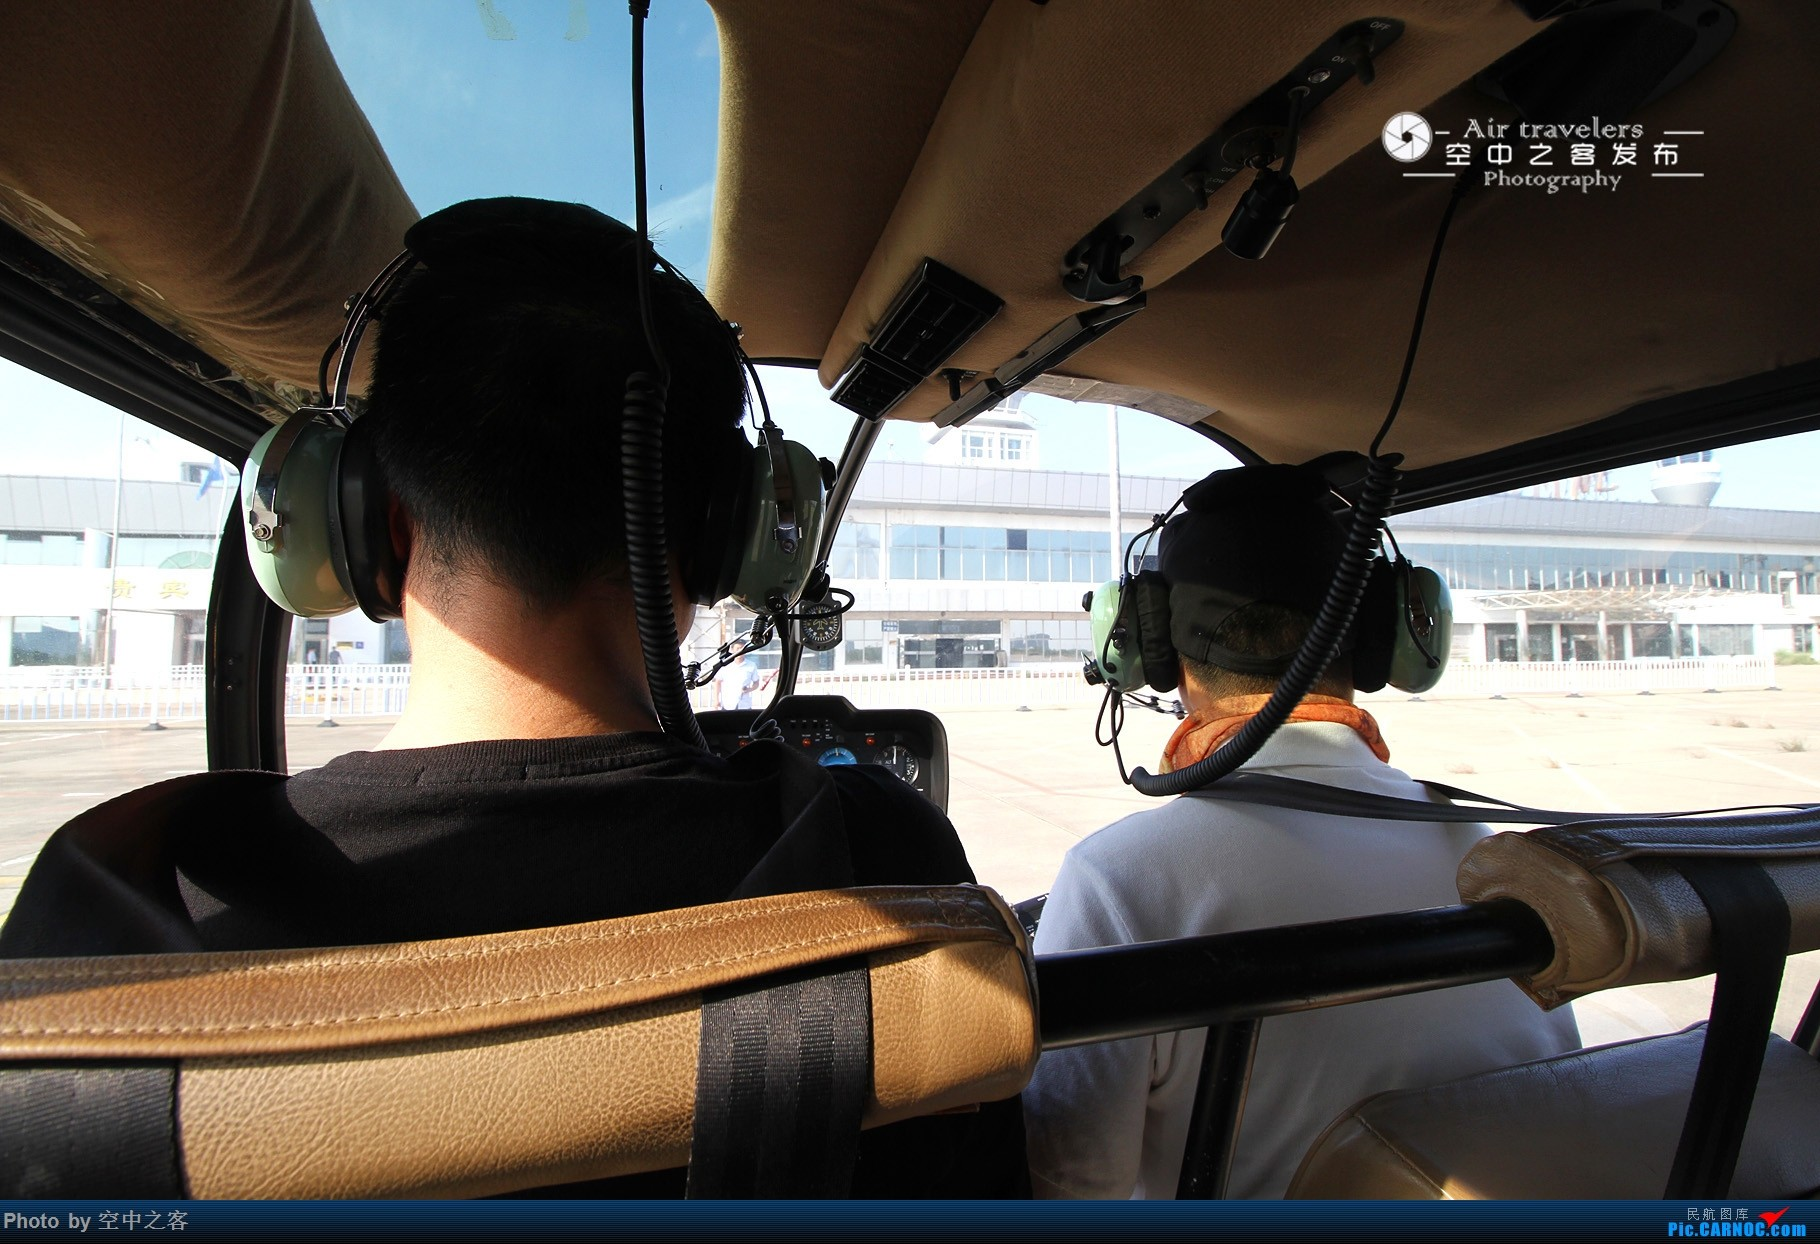 Re:[原创][空中之客发布]与aiolia7456大佬体验顶宏通航R-44滨湖之旅 ROBINSON R44 II B-7261 合肥骆岗机场